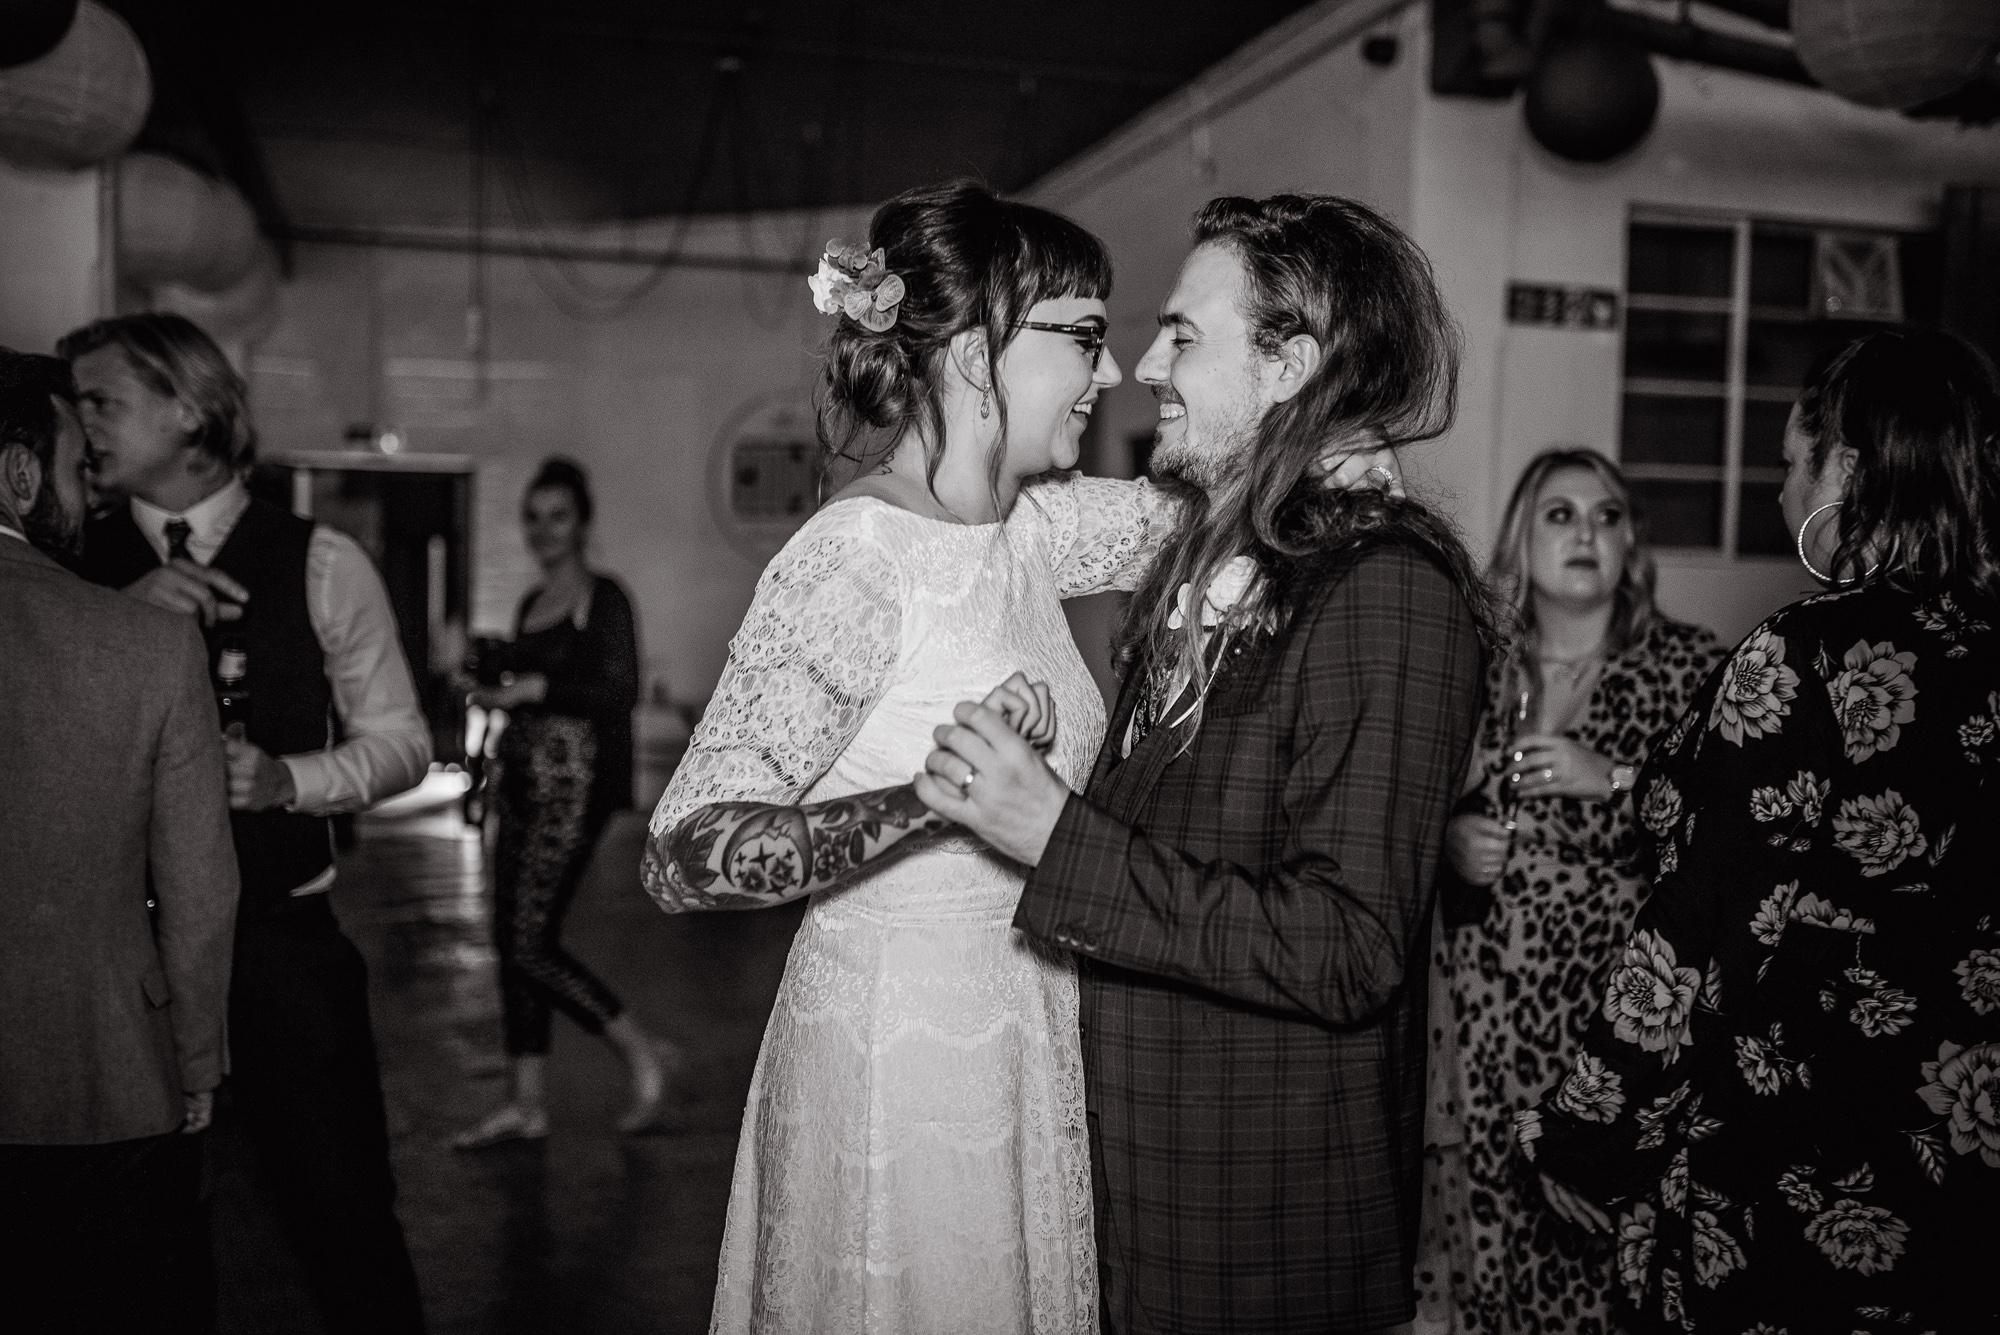 Harriet-Dahlia-Bespoke-Lace-Silk-Bohemian-Wedding-Dress-Sleeves-Tattooed-Bride-Alternative-Wedding-Sheffield-45.jpg